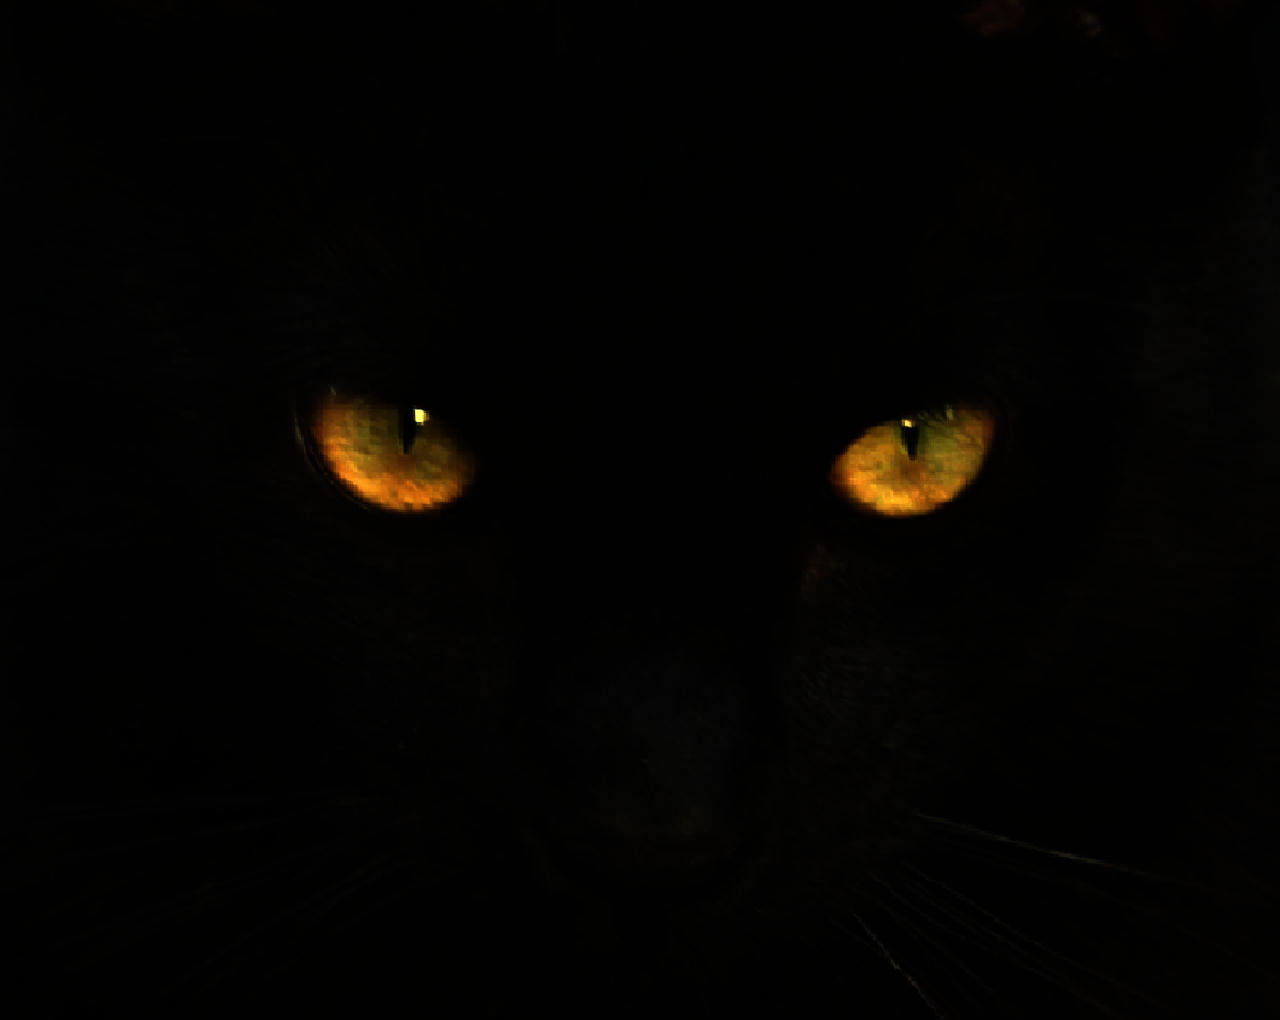 black cat eyes illuminating in darkness